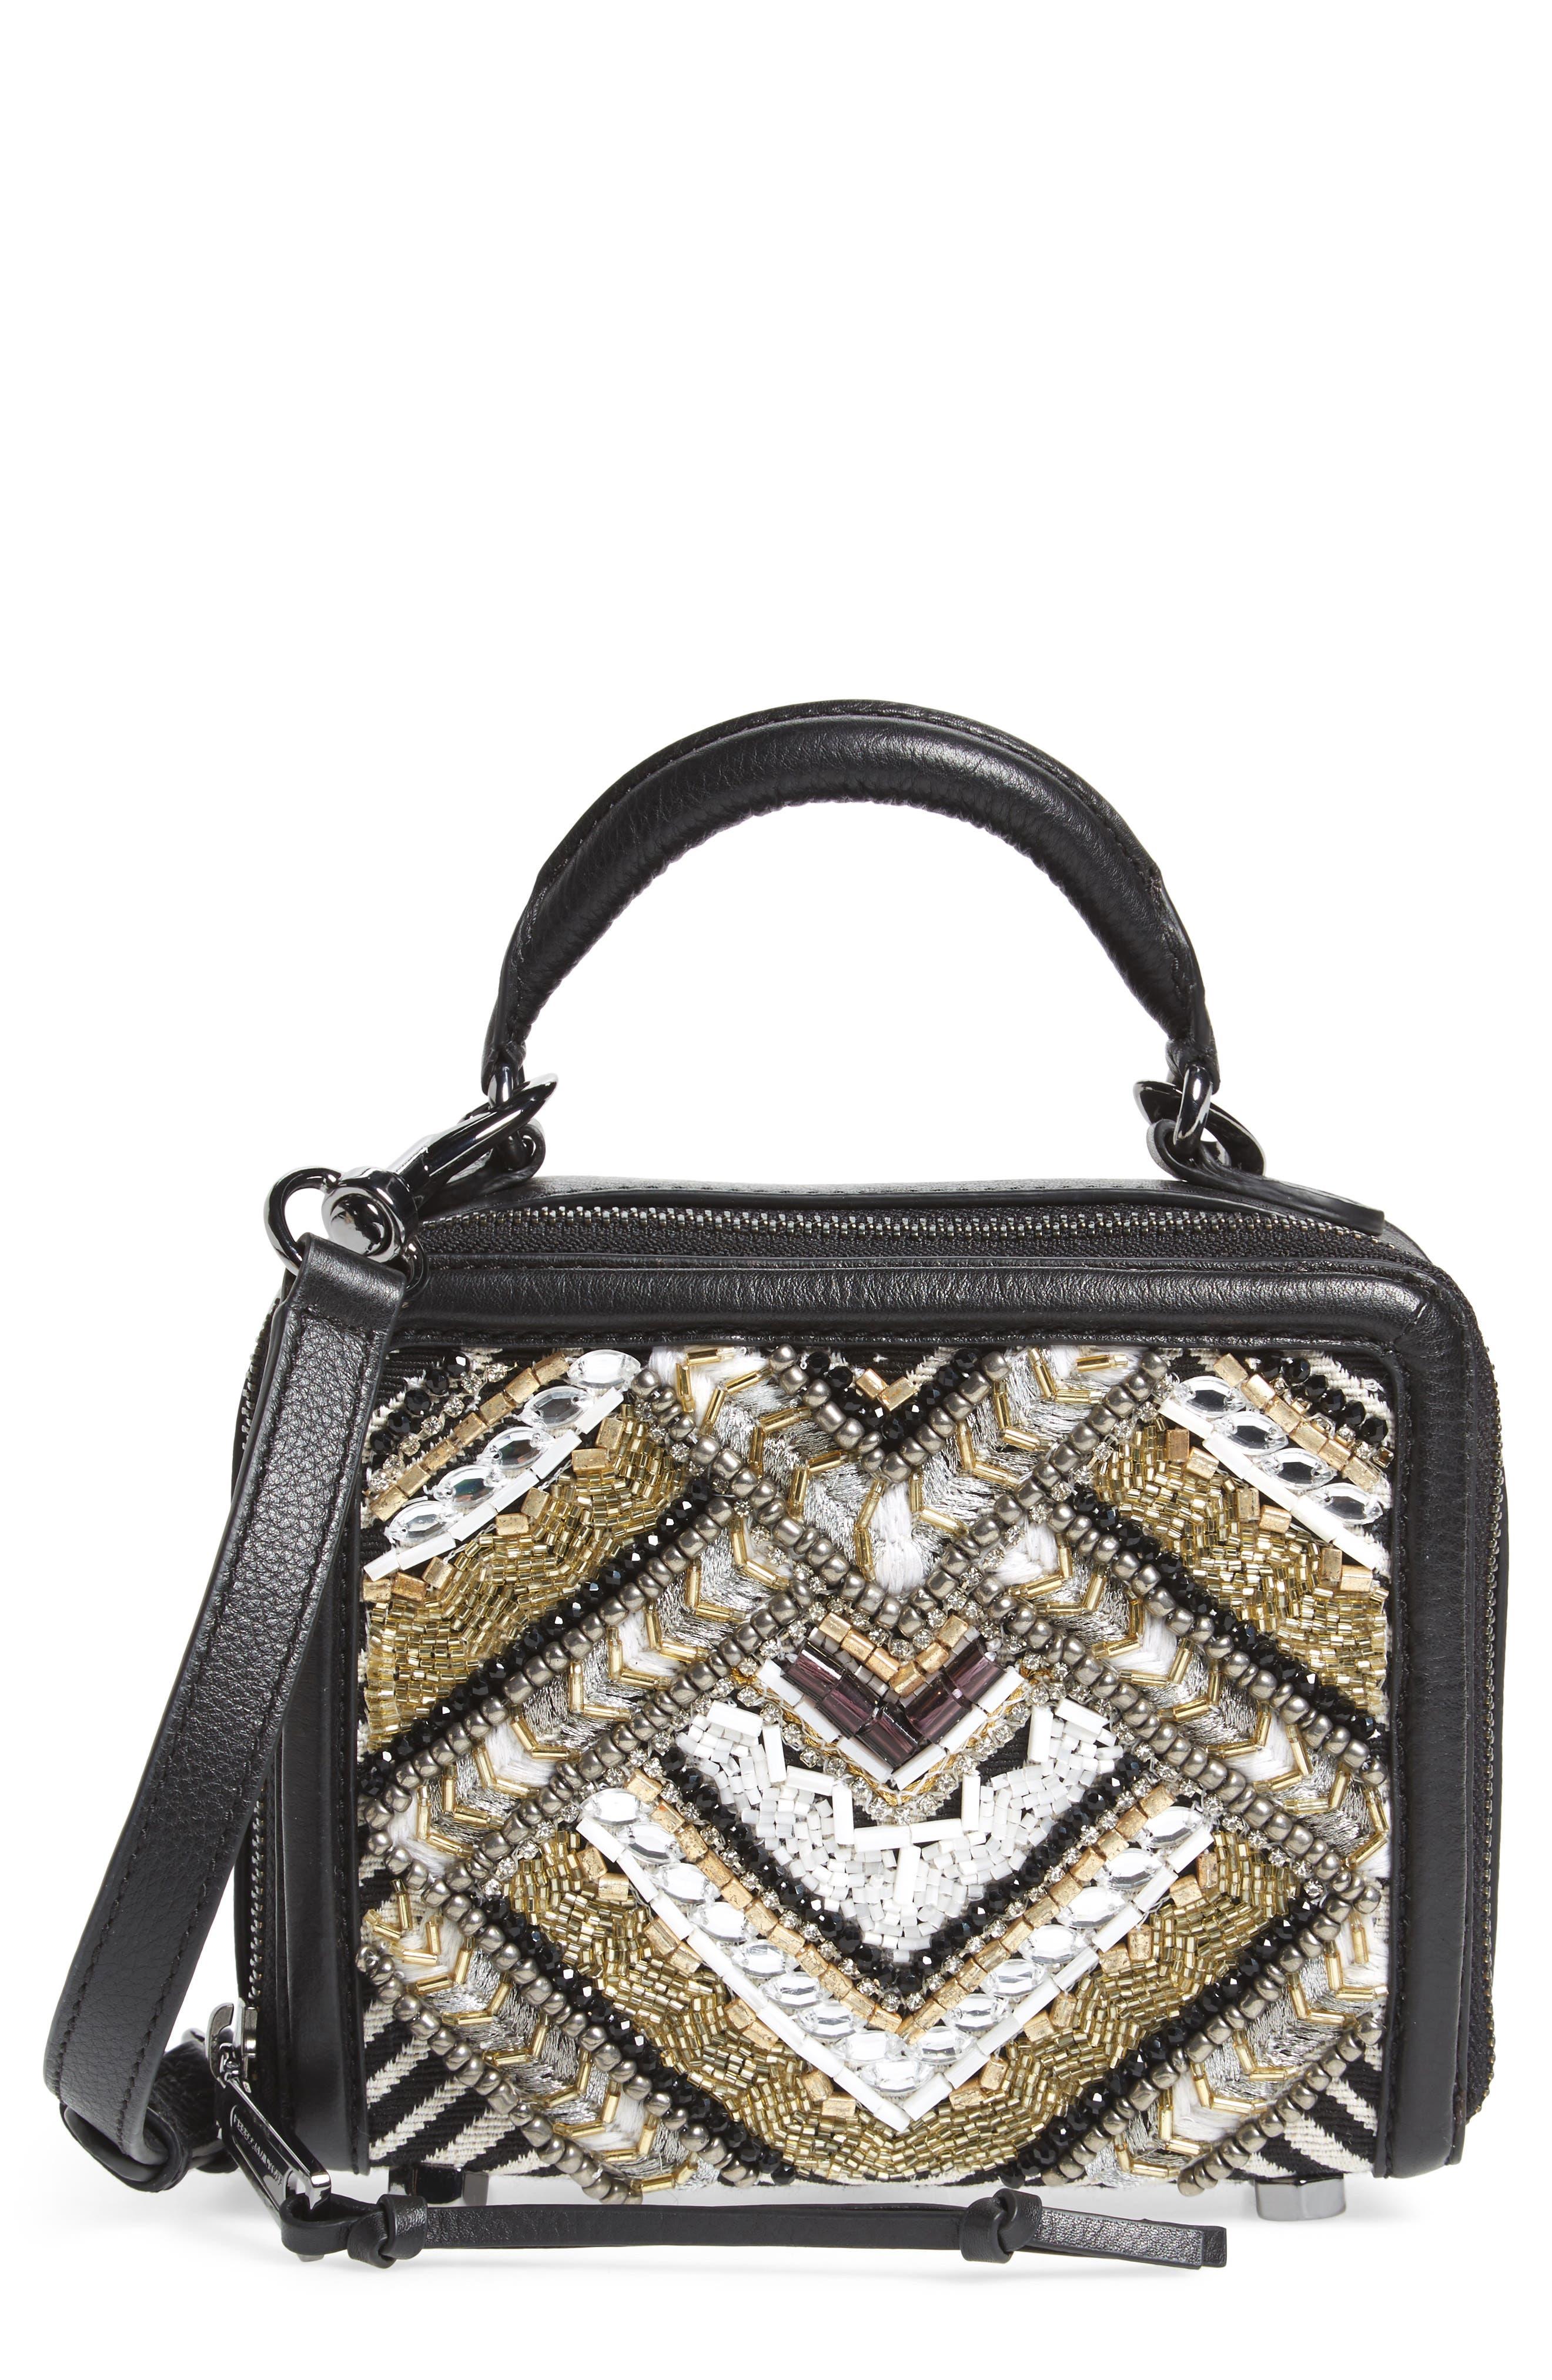 Wonder Box Embellished Crossbody Bag,                         Main,                         color, Black Metallic Multi